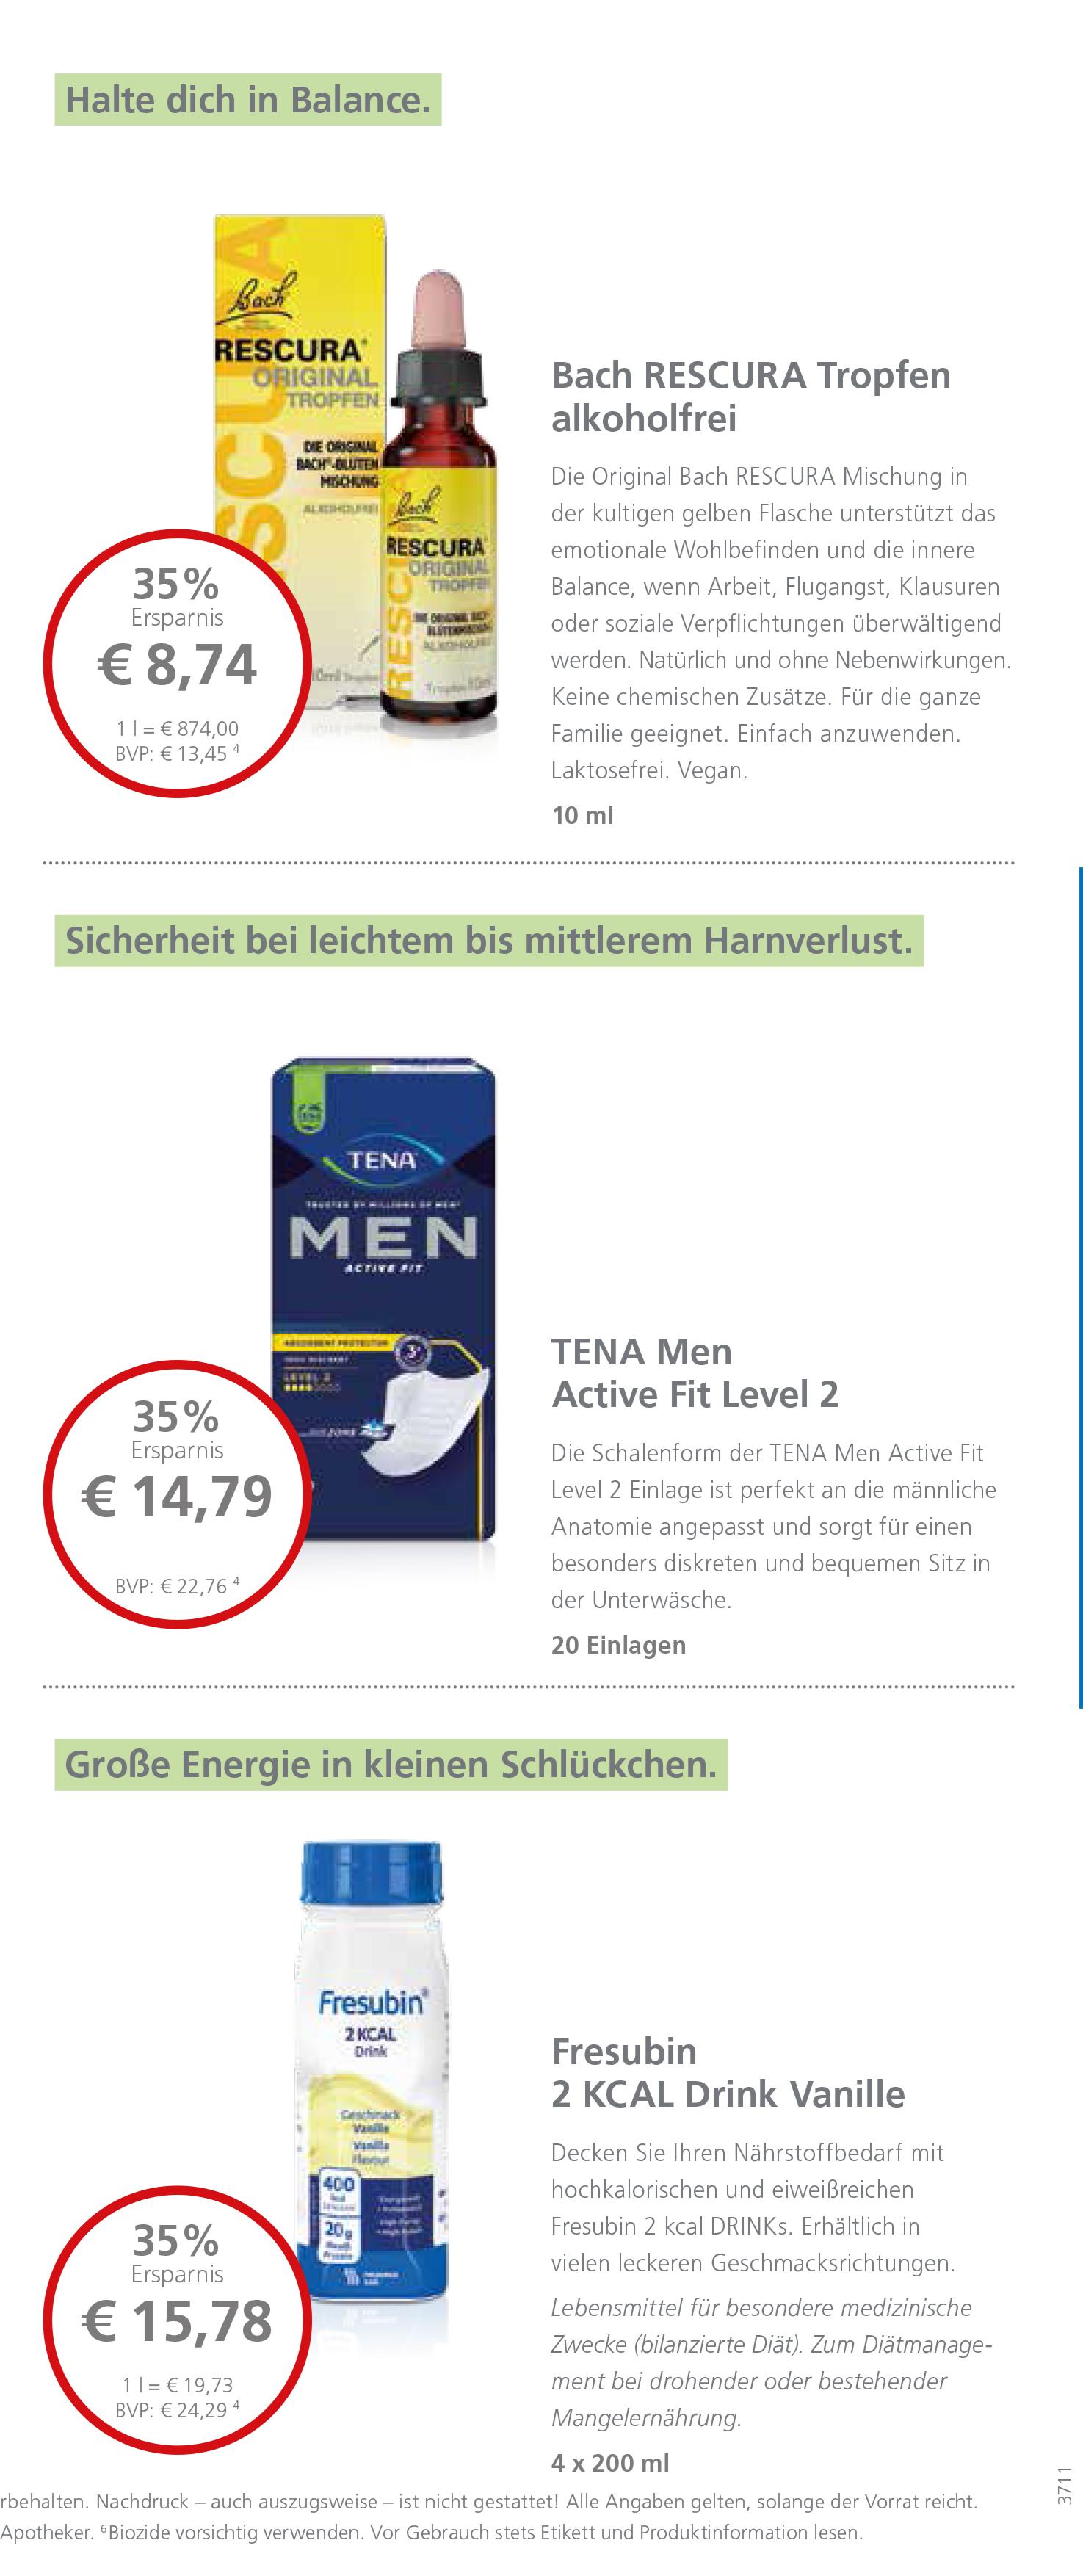 https://mein-uploads.apocdn.net/17978/leaflets/17978_flyer-Seite4.png